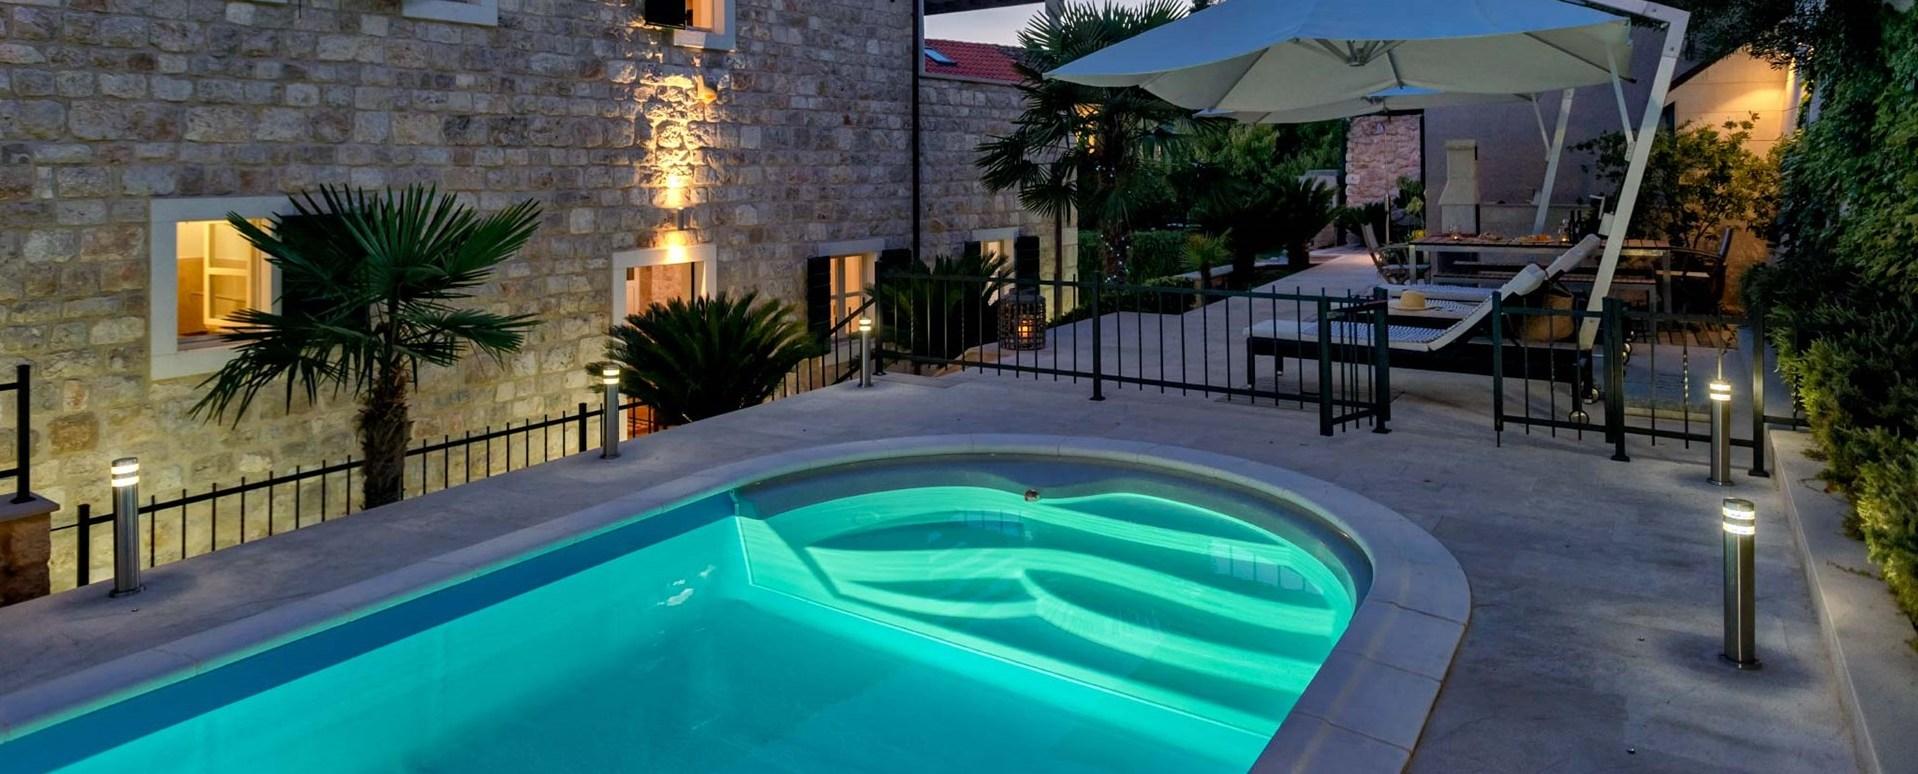 hvar-house-private-pool